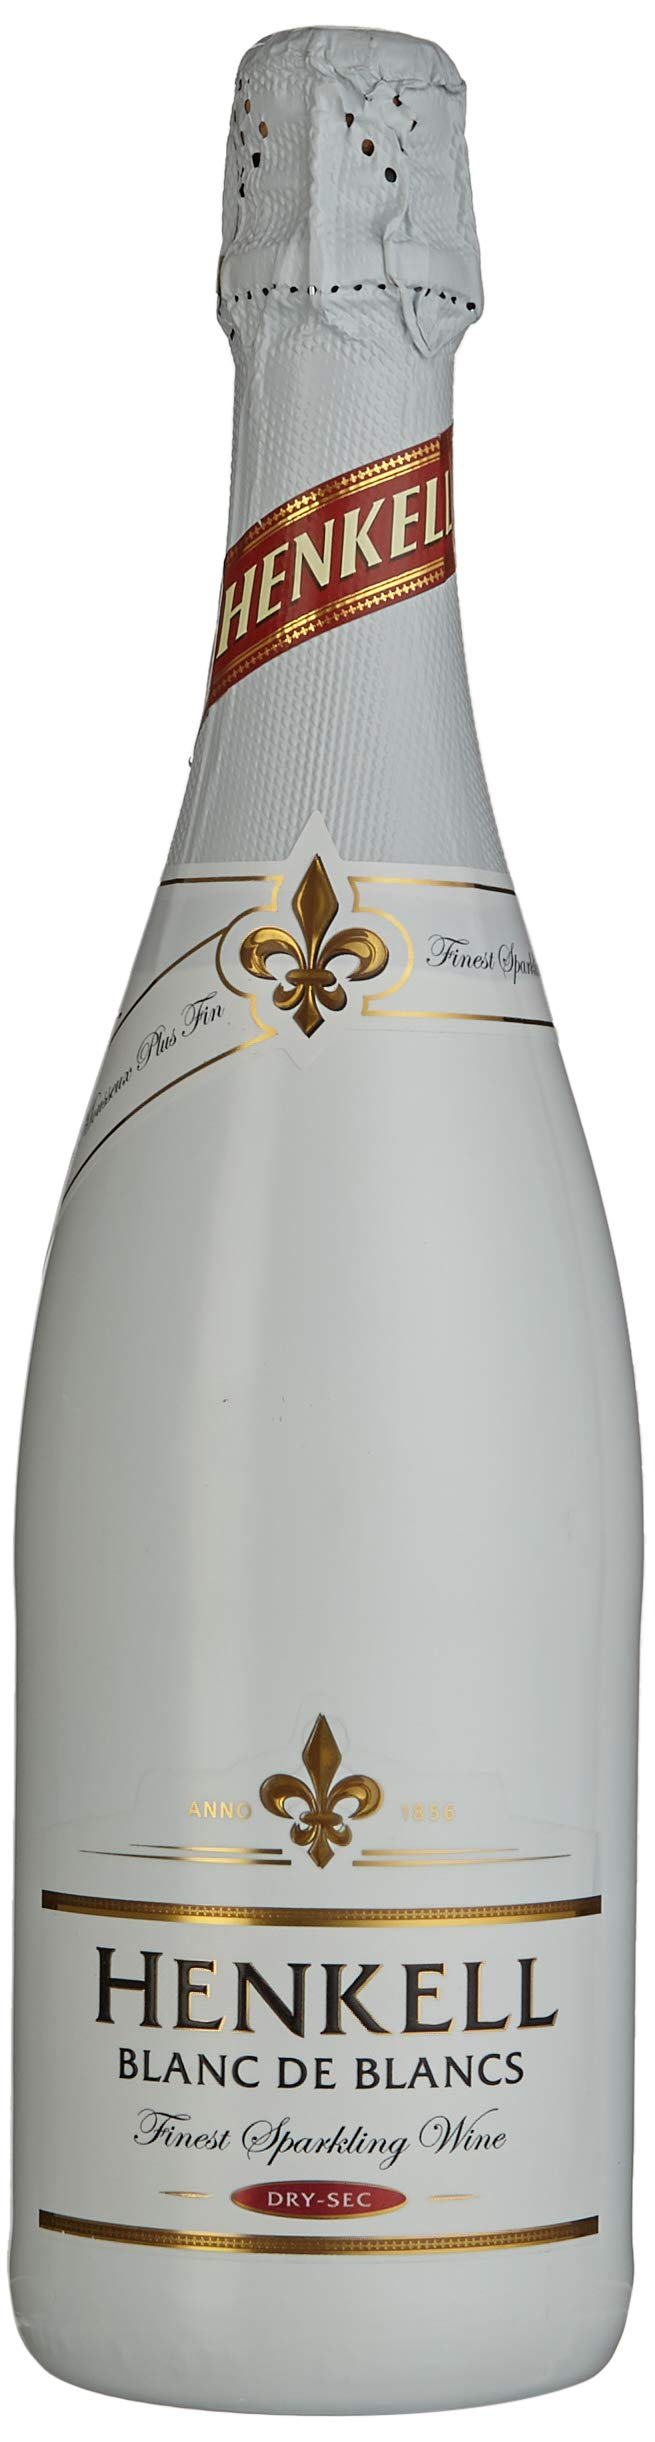 Henkell-Blanc-de-Blancs-White-Edition-1-x-075-l